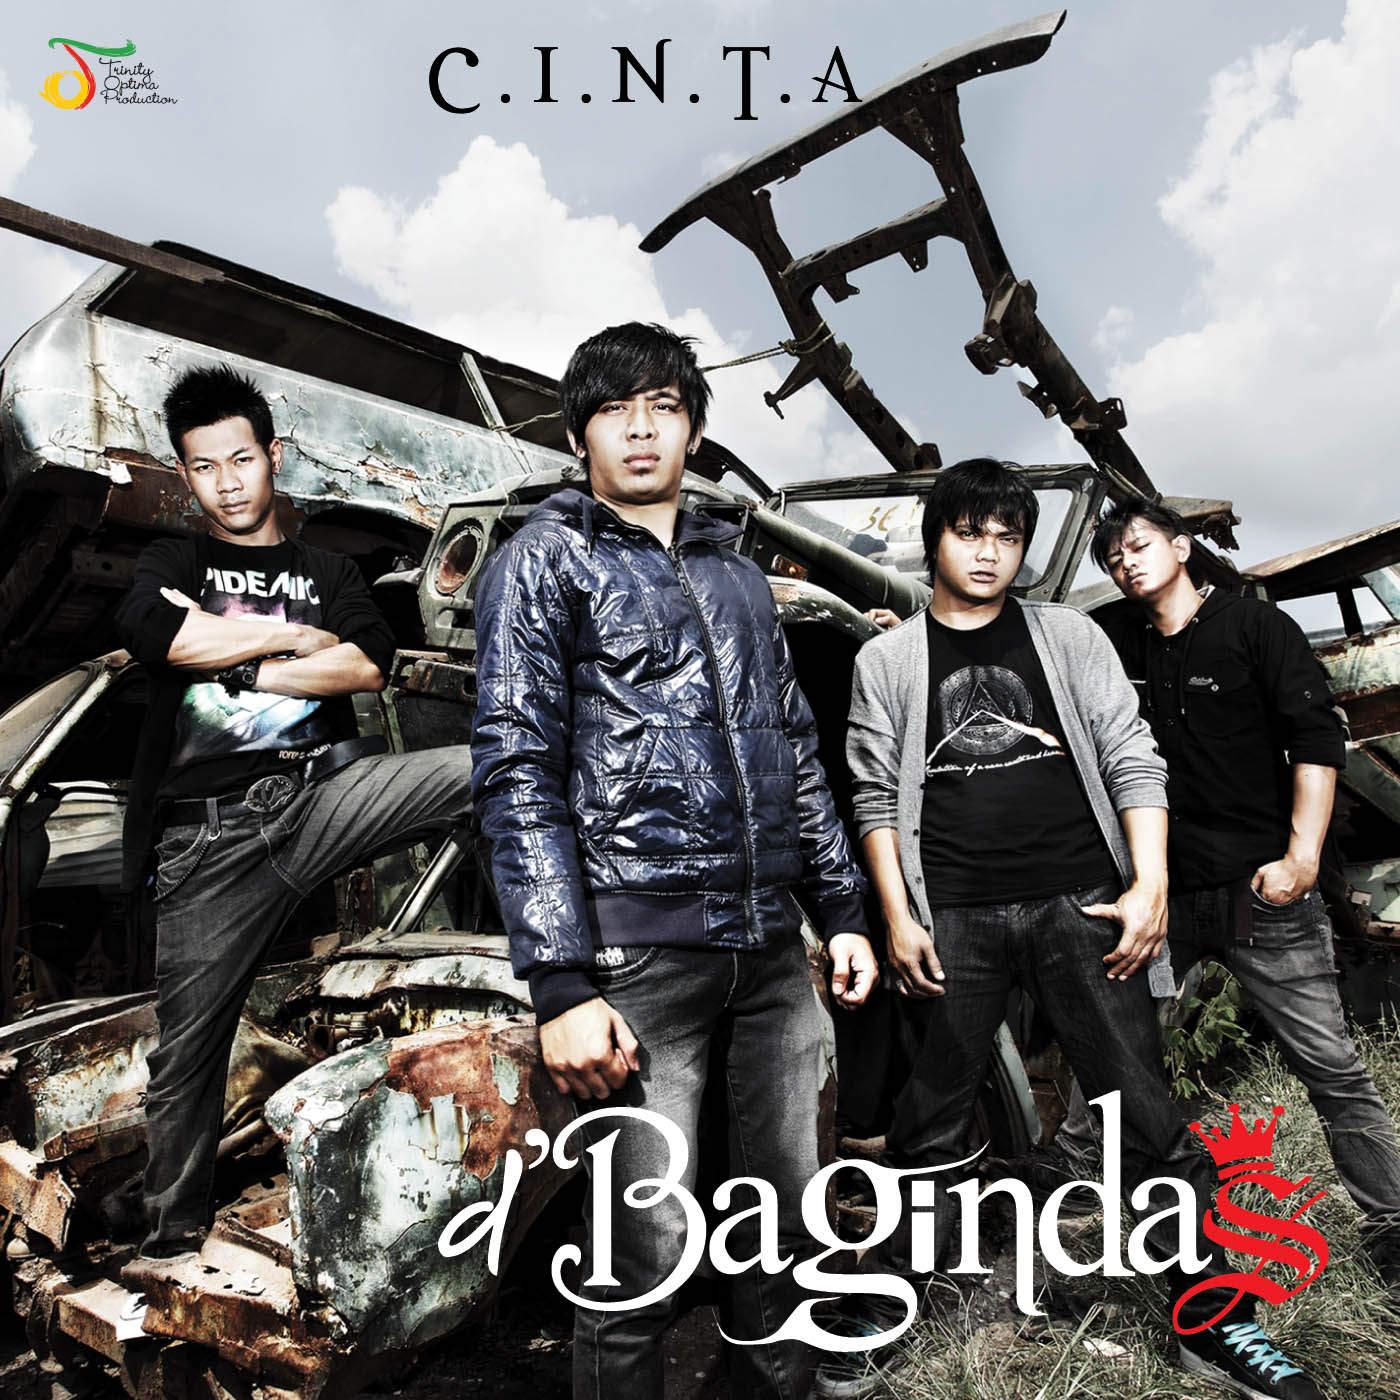 Chord Gitar Kerispatih Demi Cinta G: Panji's POV: D'Bagindas Discography